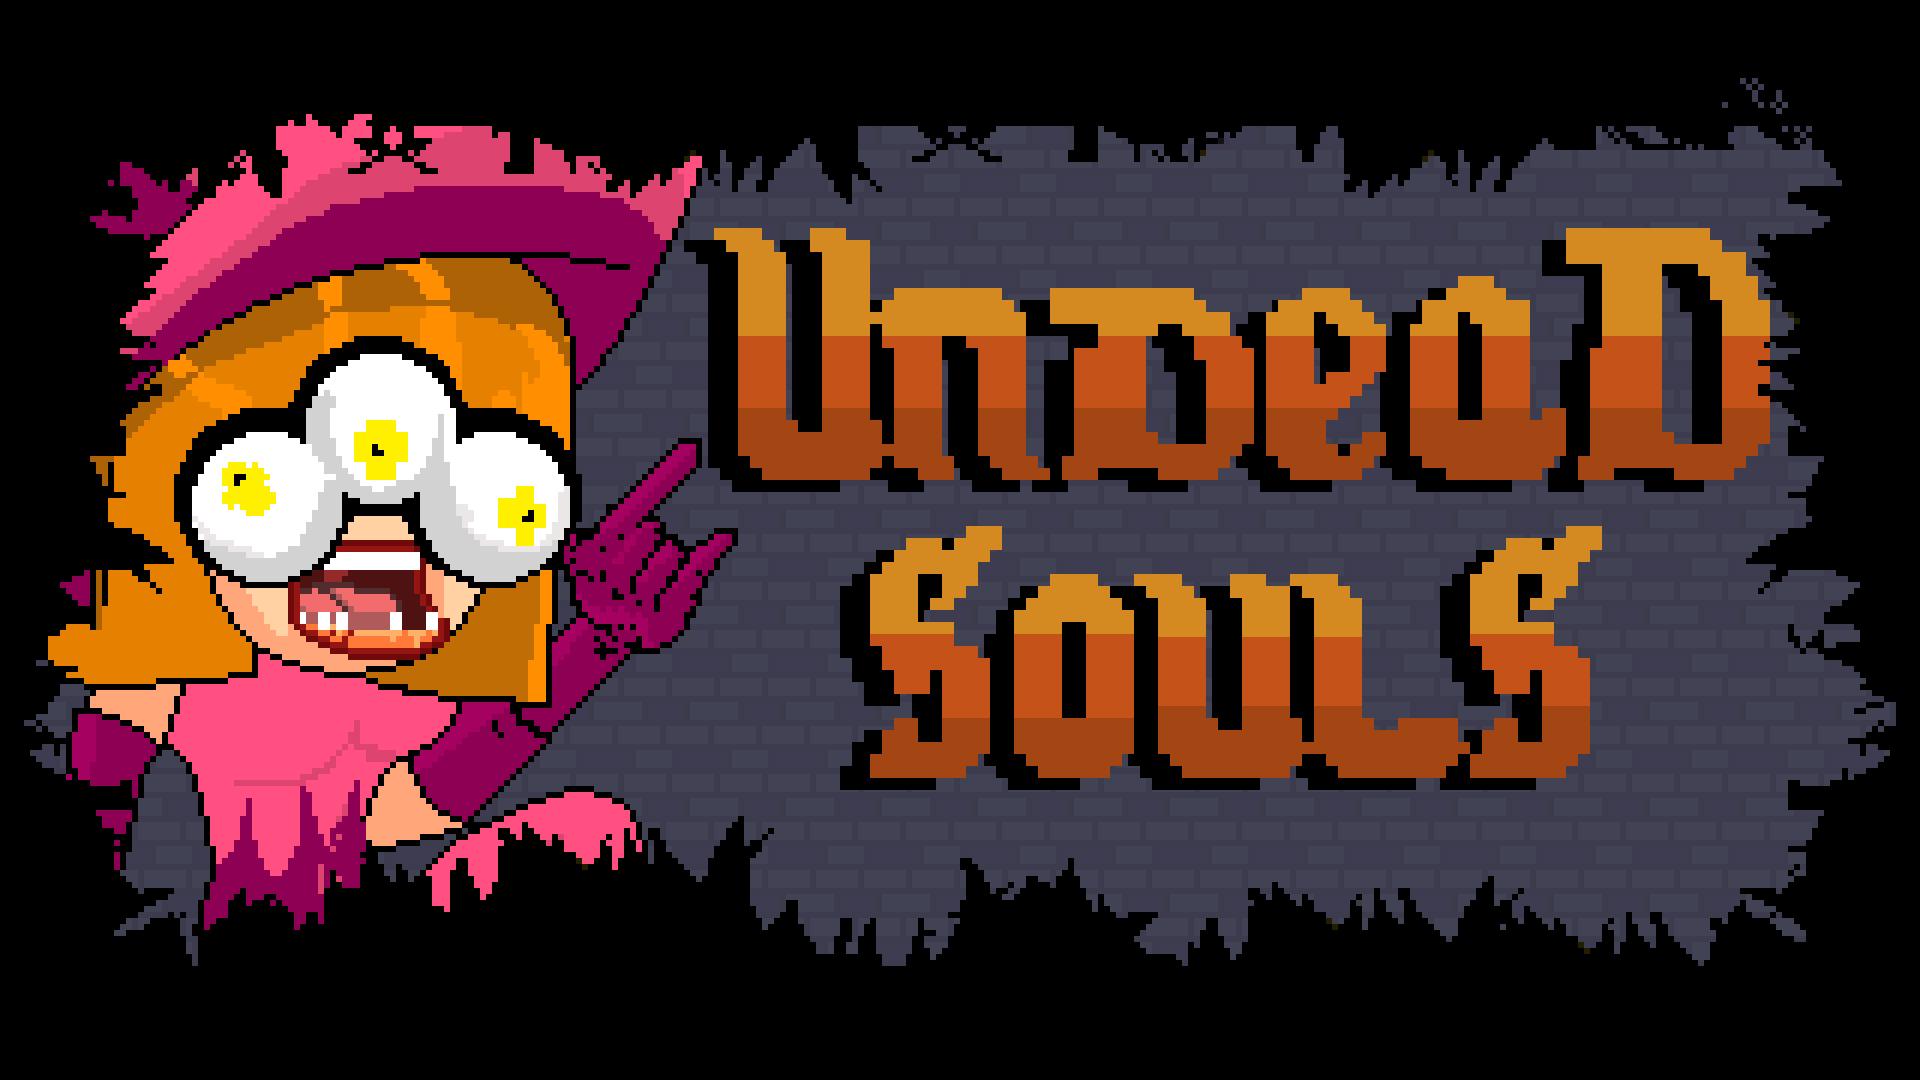 Undead Souls